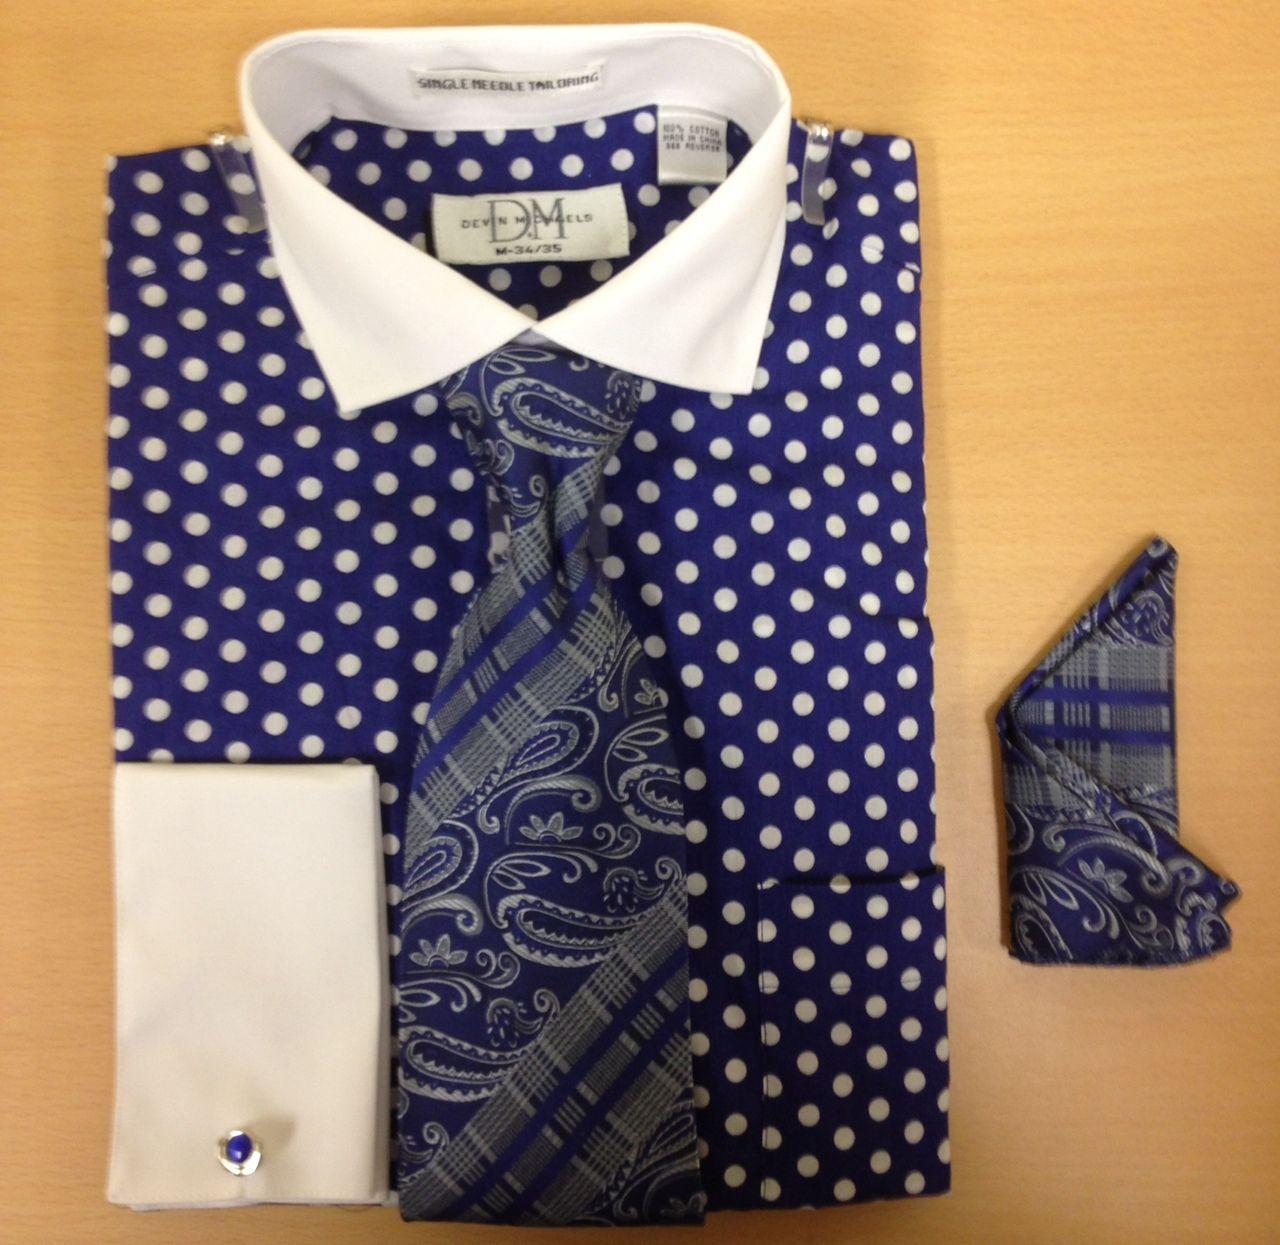 Men's Fashion Polka Dot Cufflink Dress Shirt Set - Navy/White